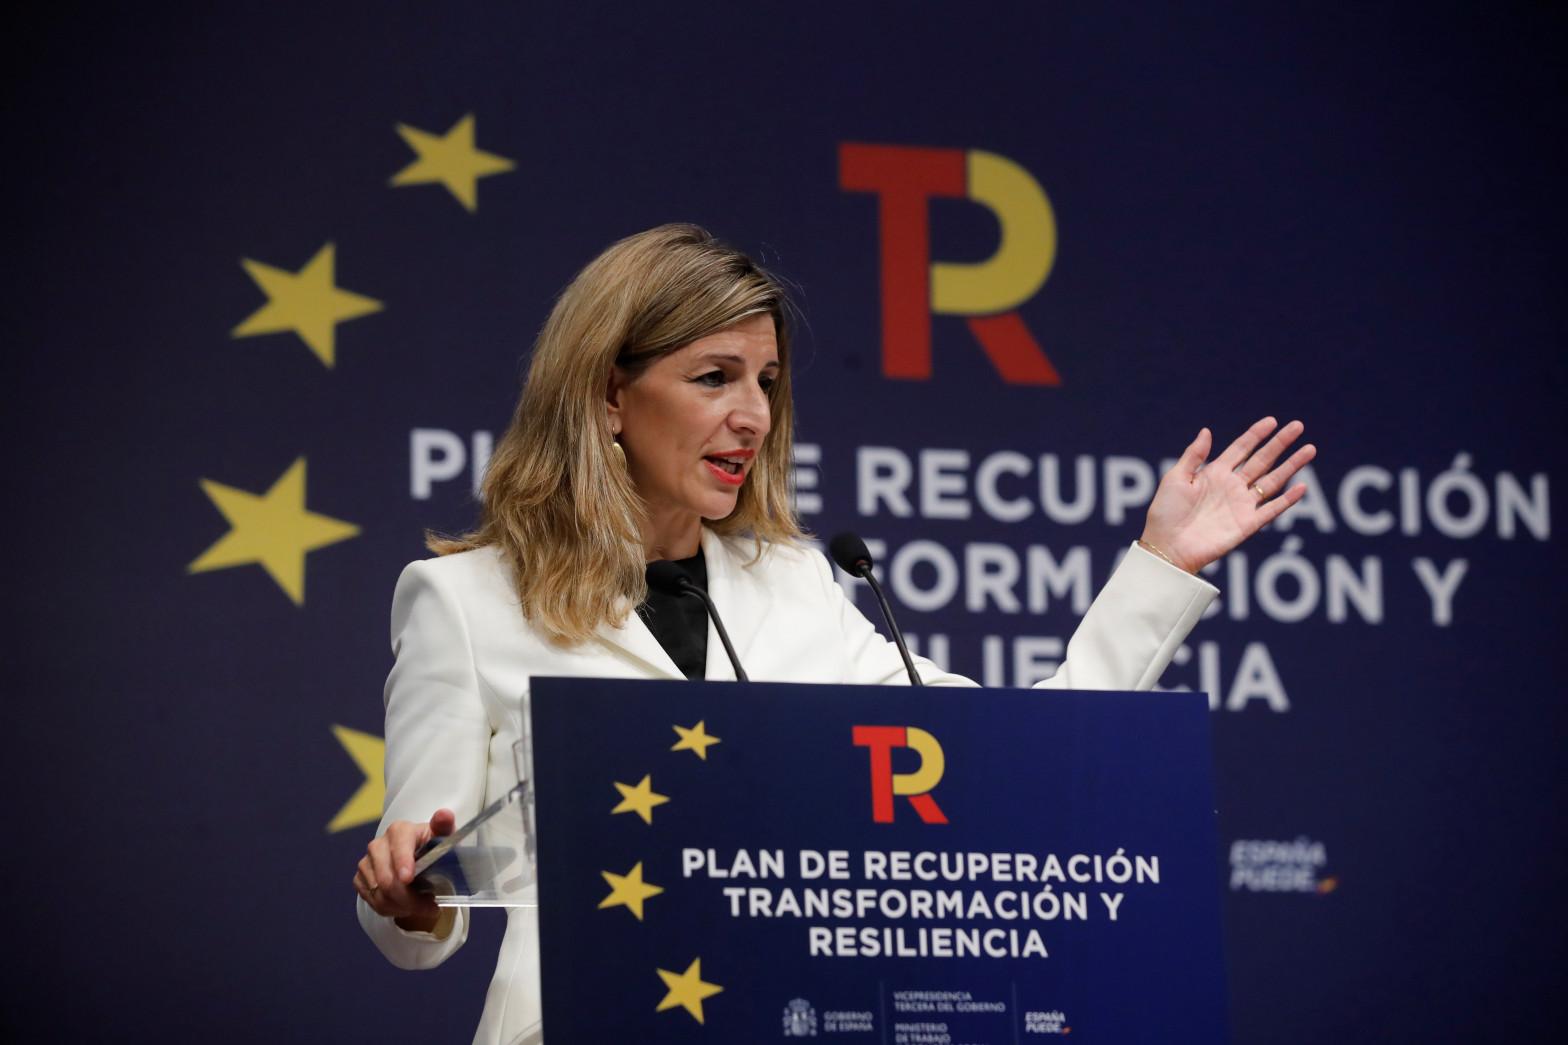 CCOO aconseja a Yolanda Díaz prescindir de Podemos y buscar una confluencia con Errejón